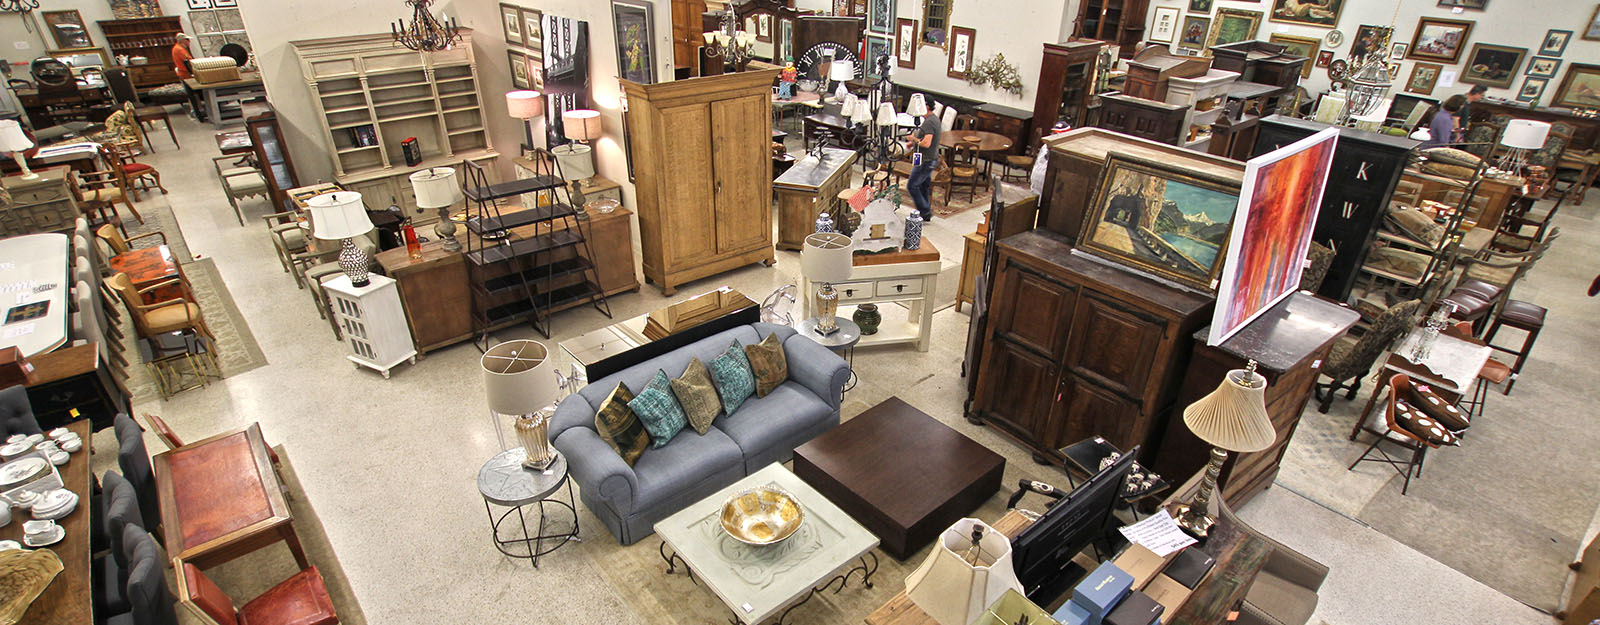 Inventory Renaissance Interiors